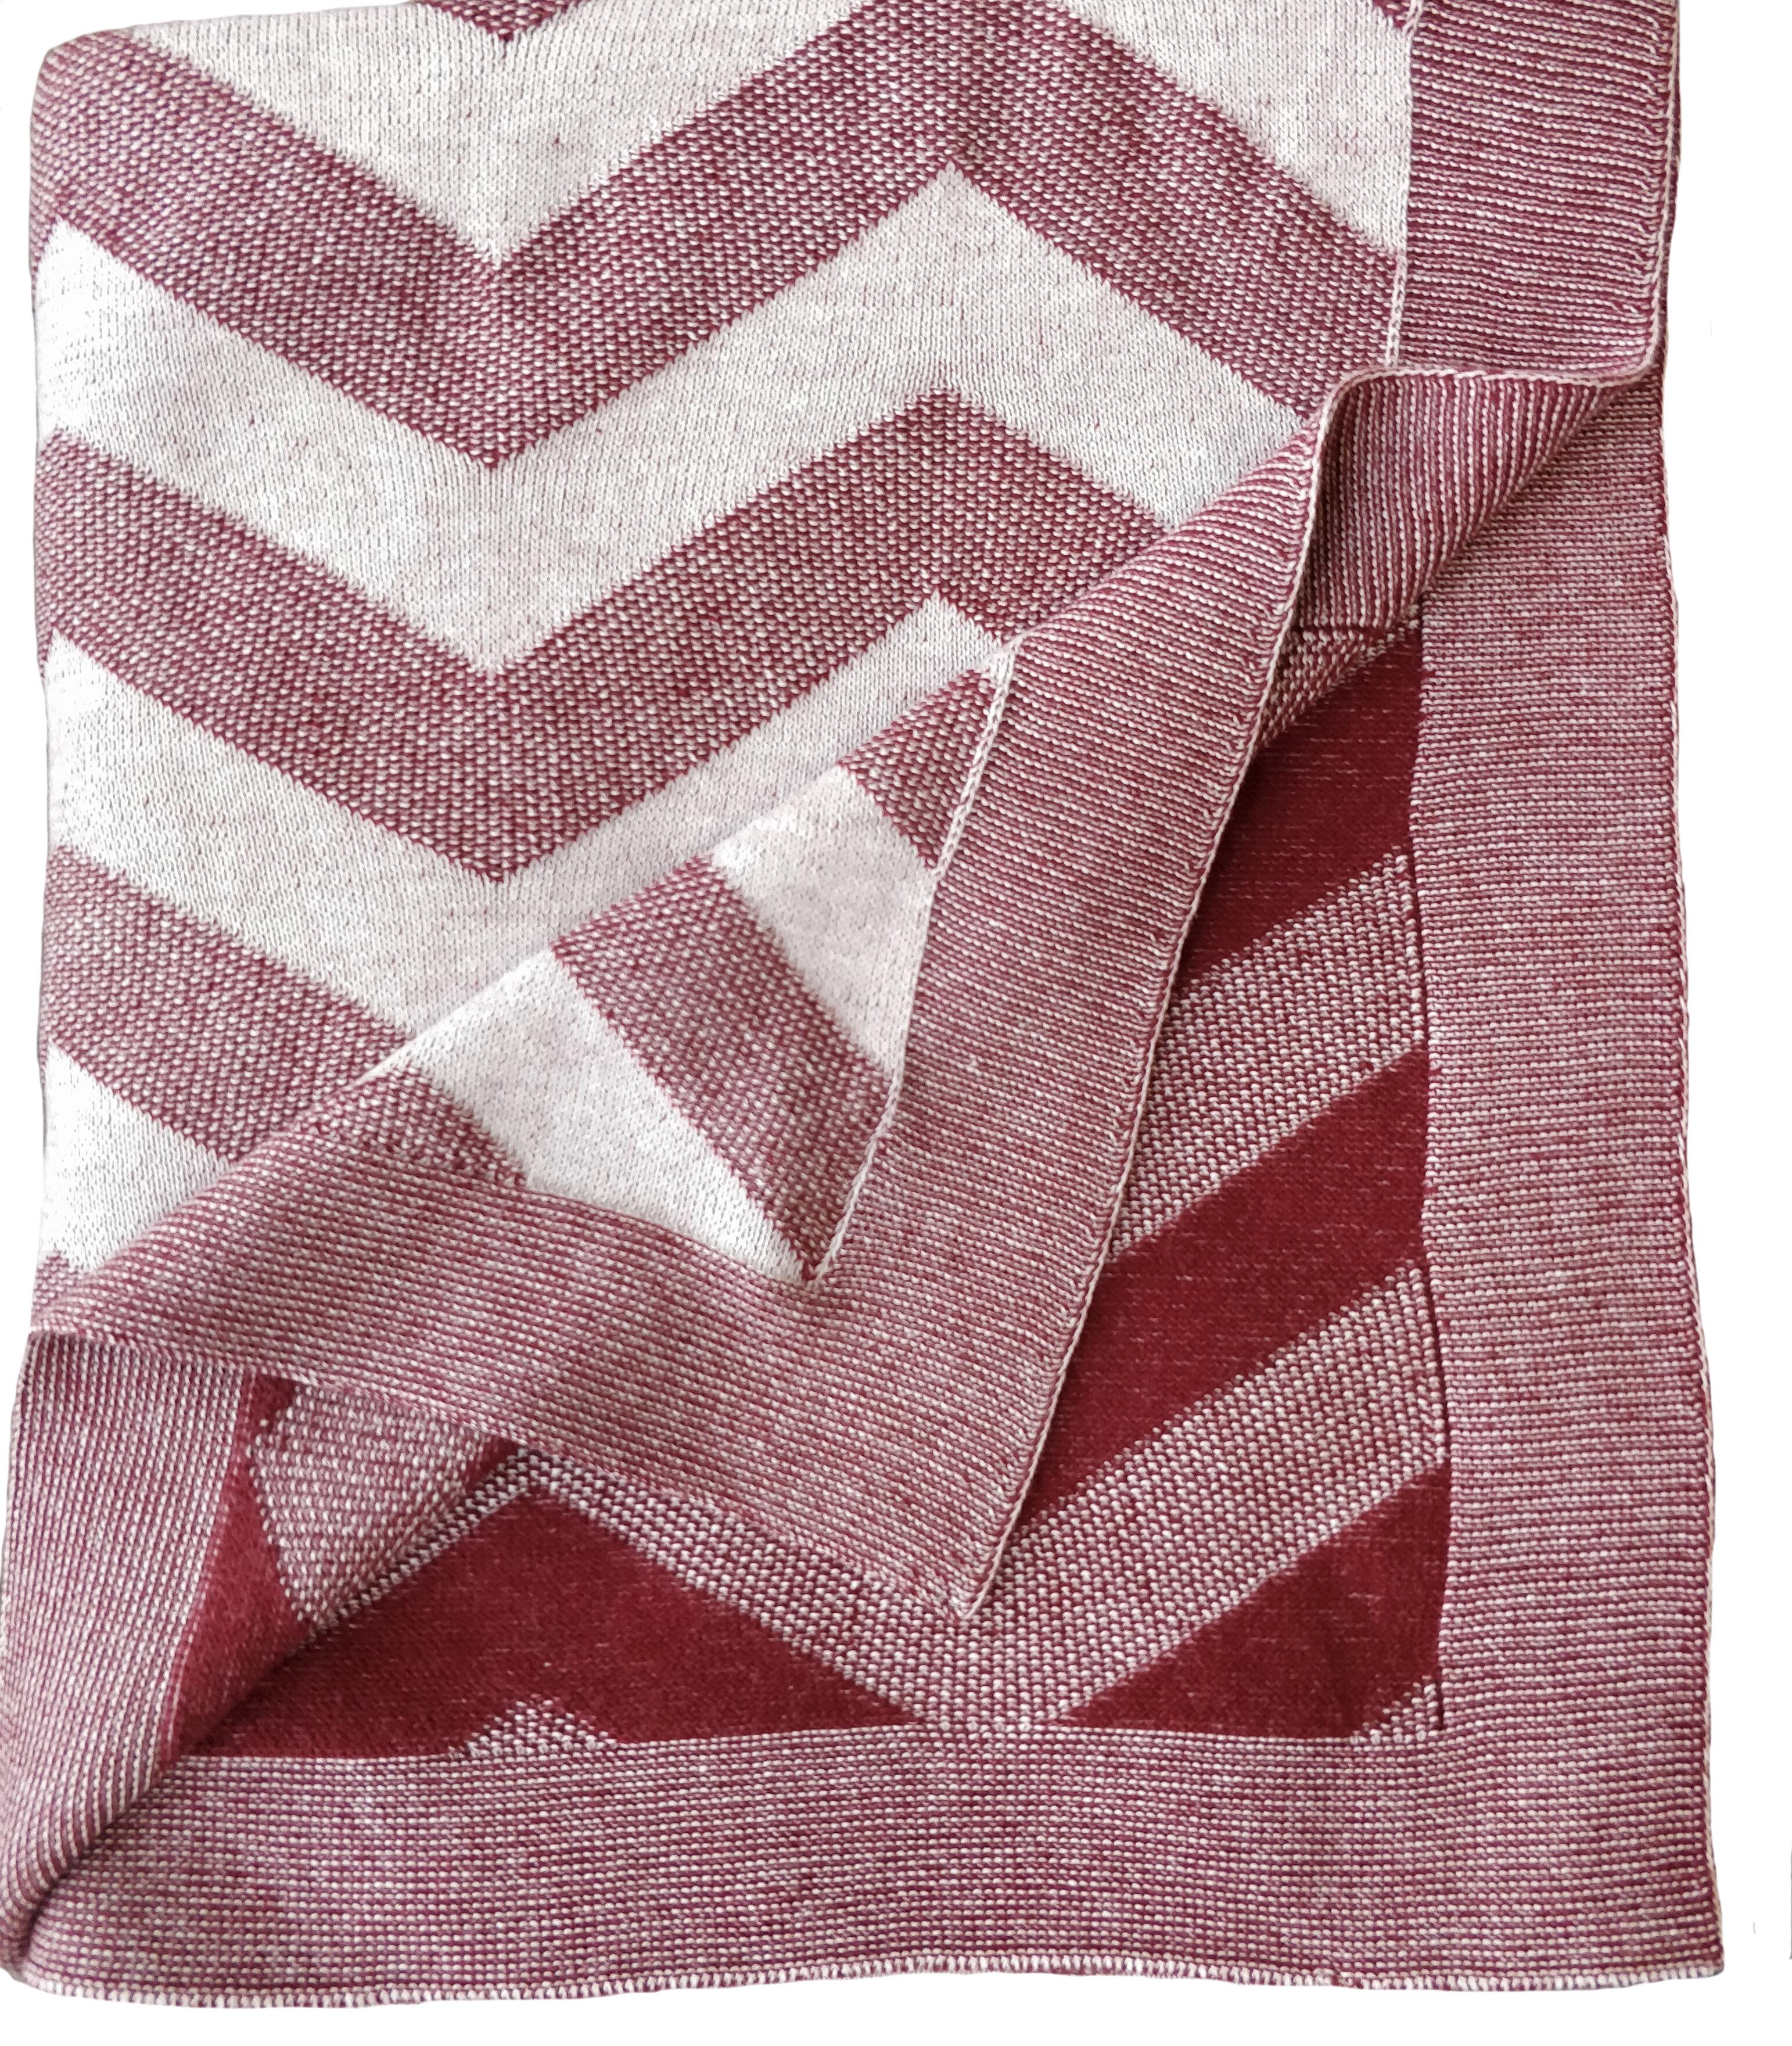 Ebern Designs Fatuberlio Luxury Zigzag 100 Cotton Blanket Wayfair